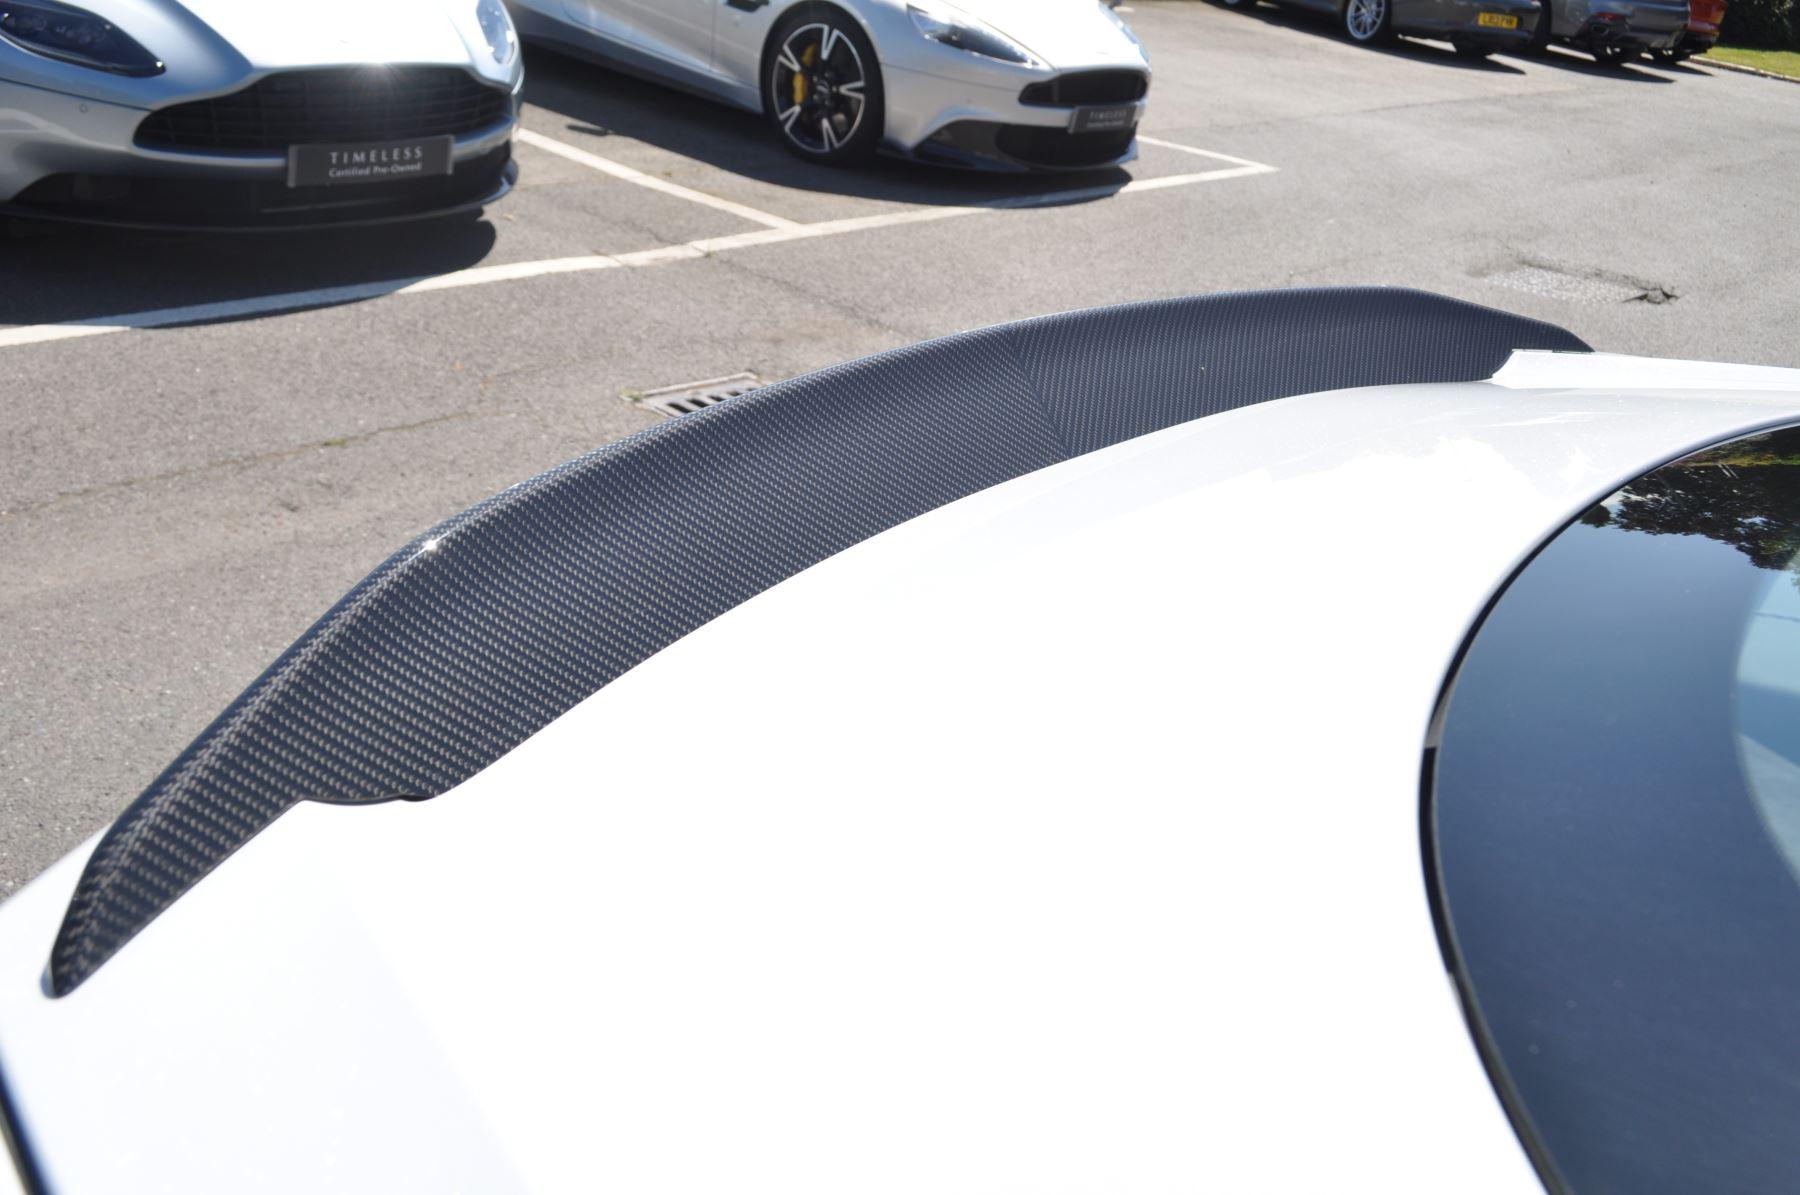 Aston Martin DBS V12 Superleggera 2dr Touchtronic image 53